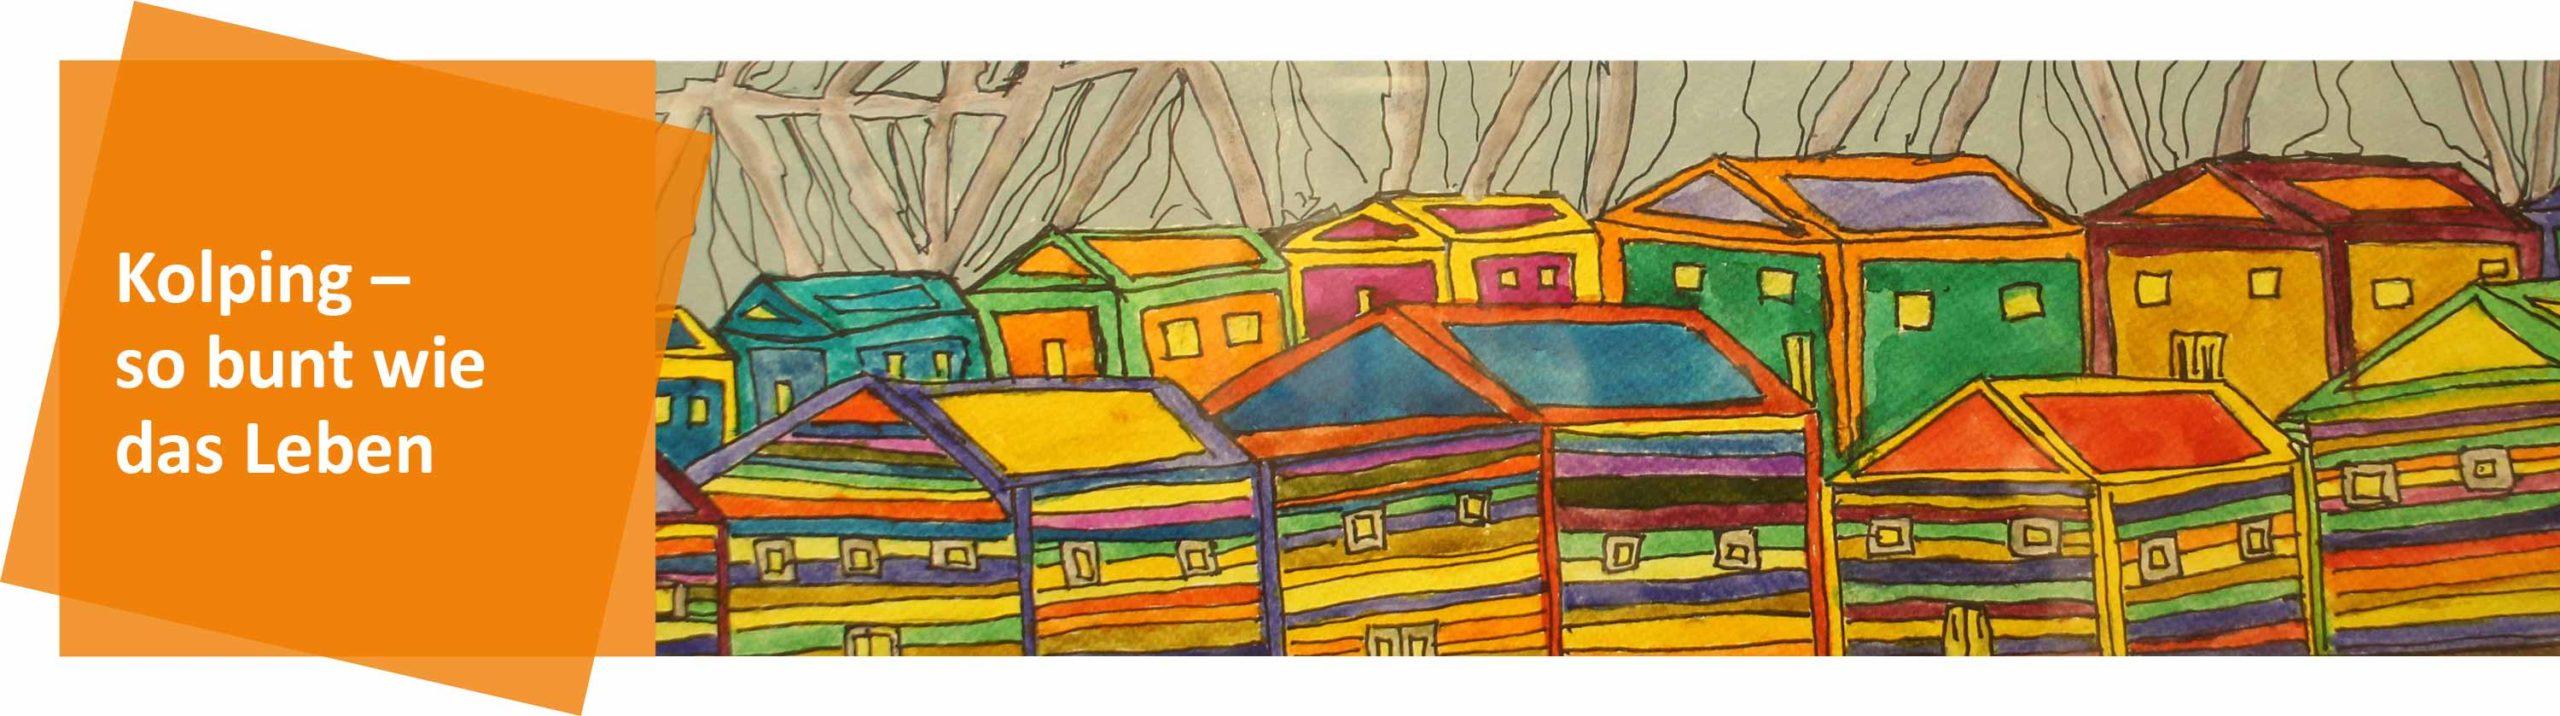 Headerbild - Bunte Häuser